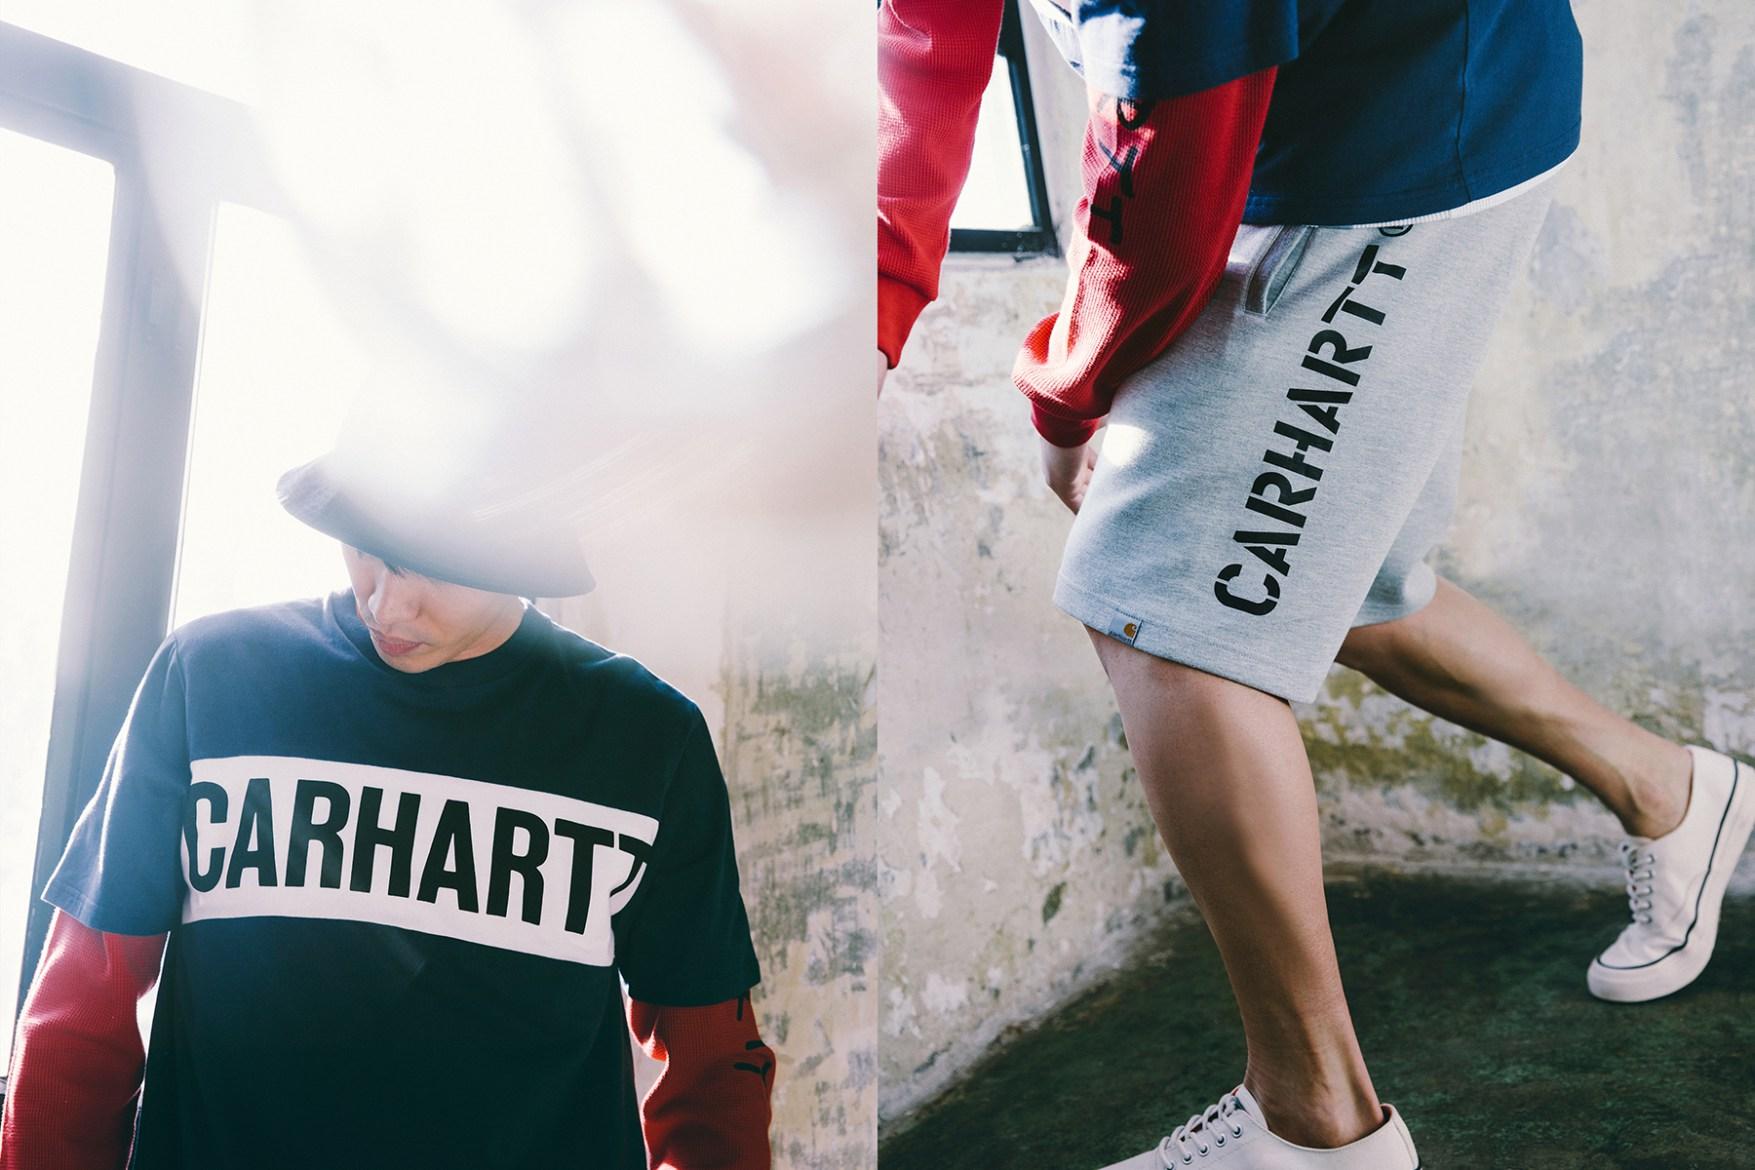 carhartt-wip-2016-ss-capsule-9